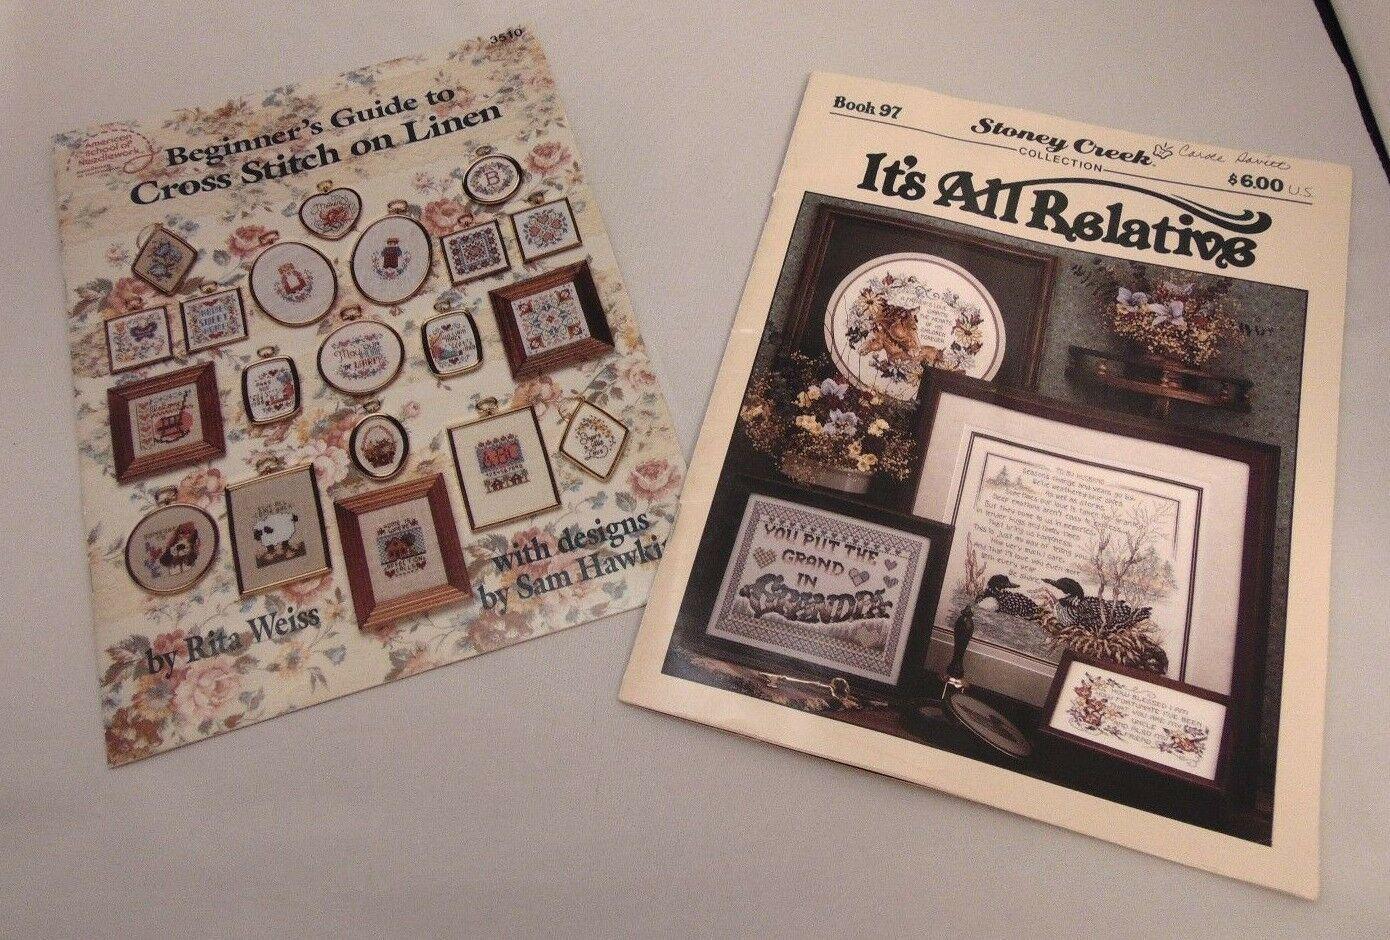 LOT of 2 Cross Stitch Pattern Books, Cross Stitch on Linen, It's All Relative